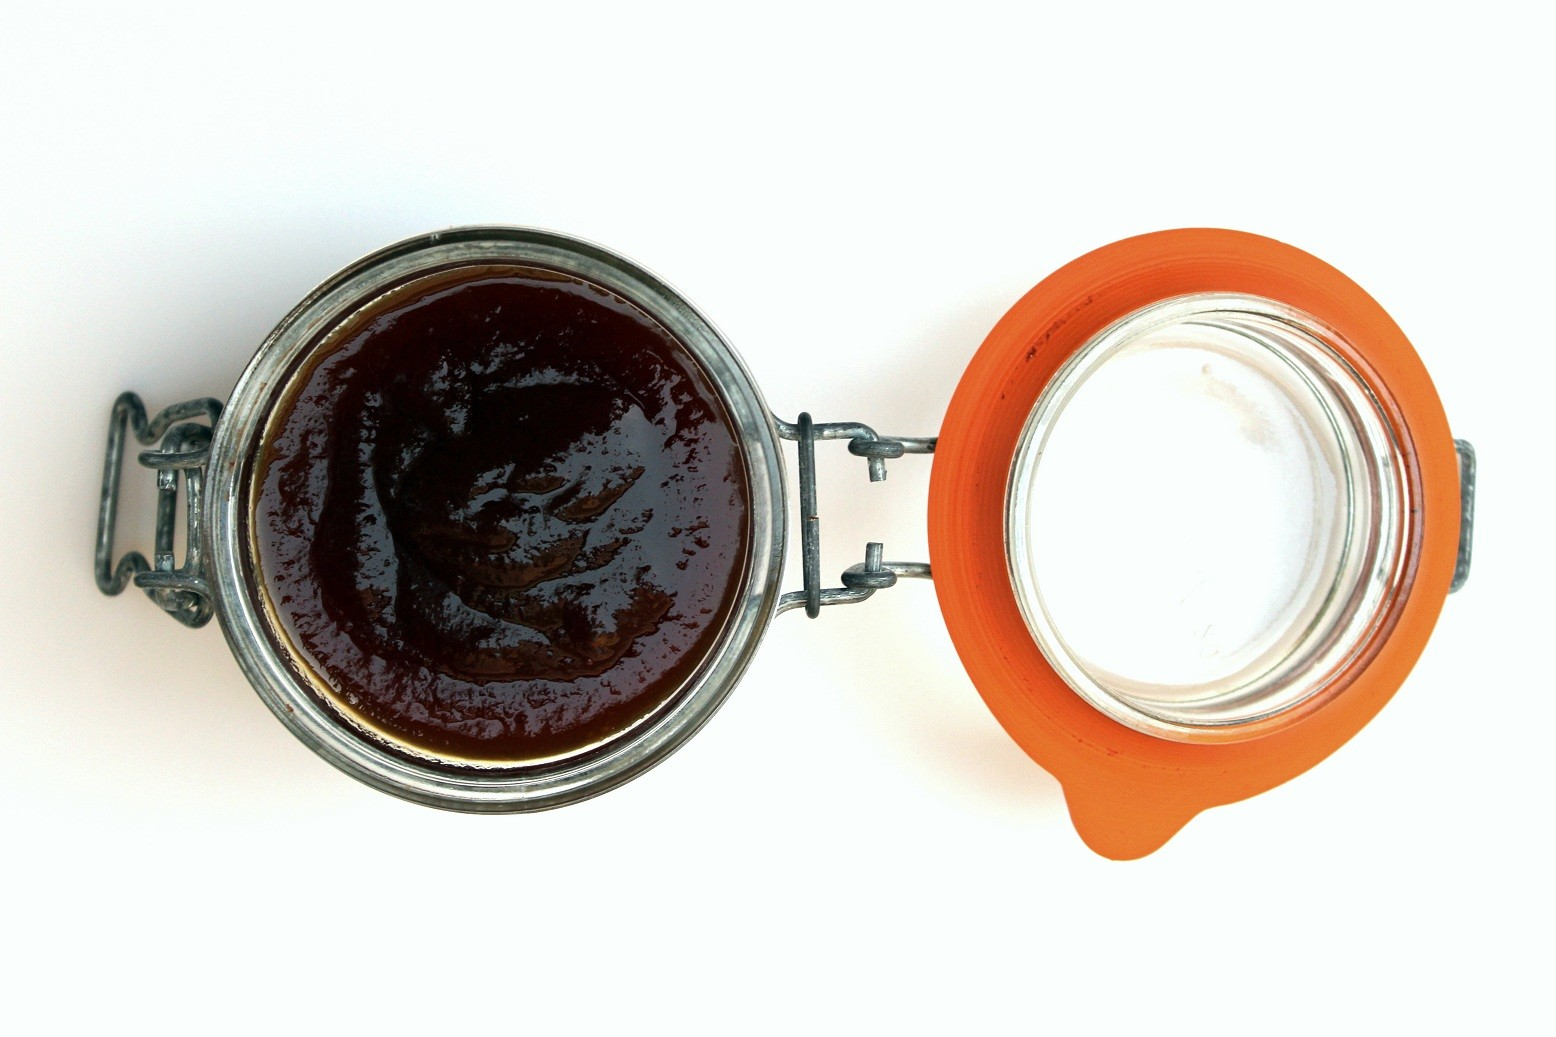 mermelada de tomate a la esencia de vainilla-2